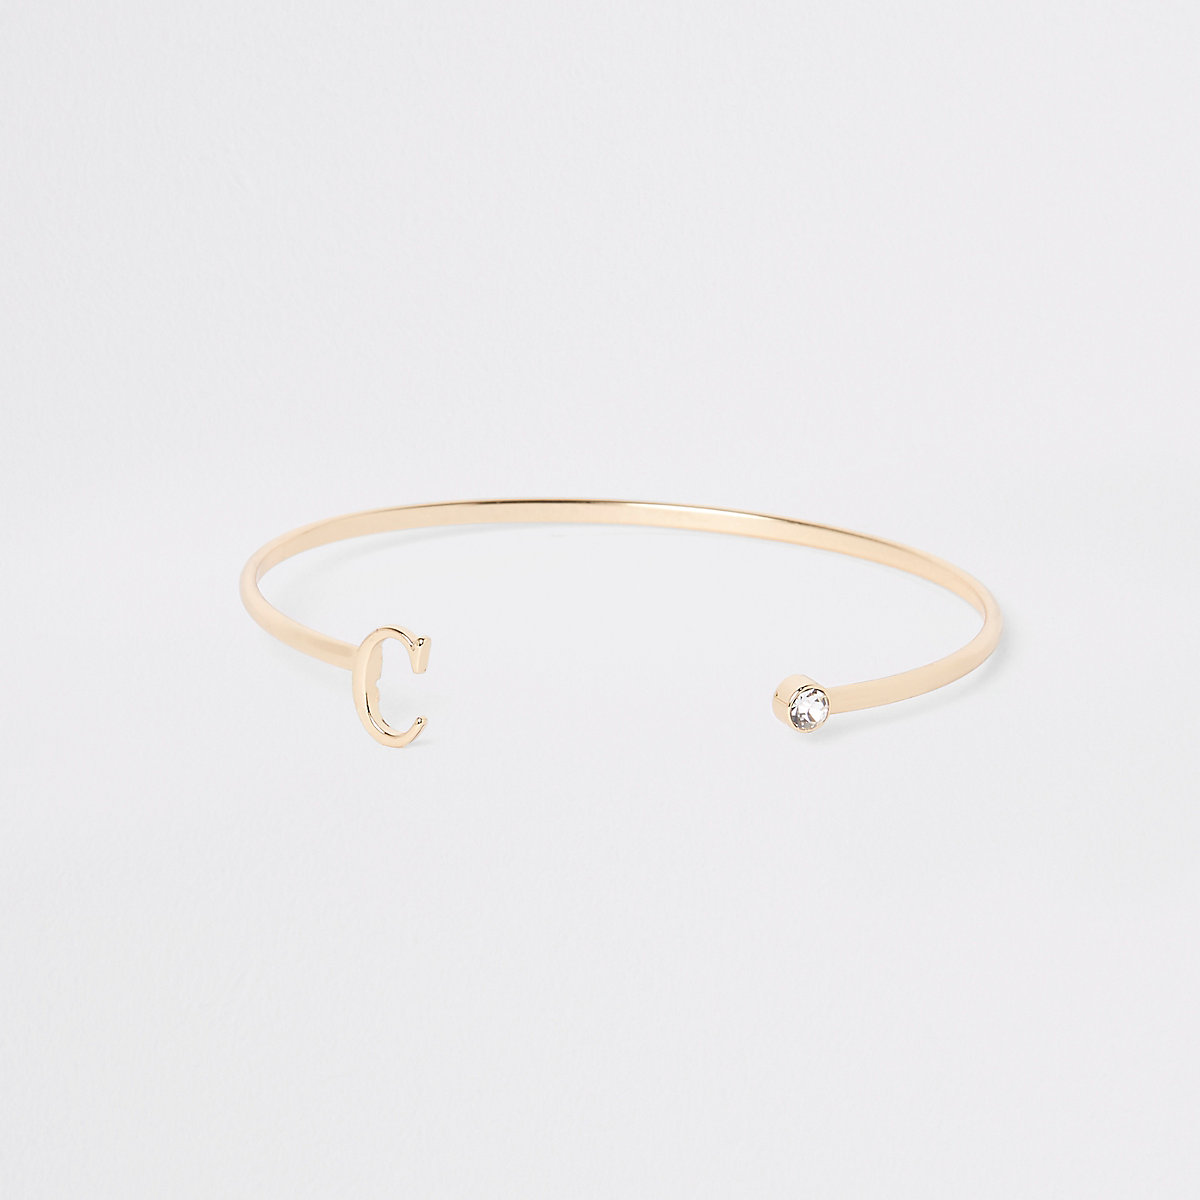 Gold plated 'C' initial cuff bracelet